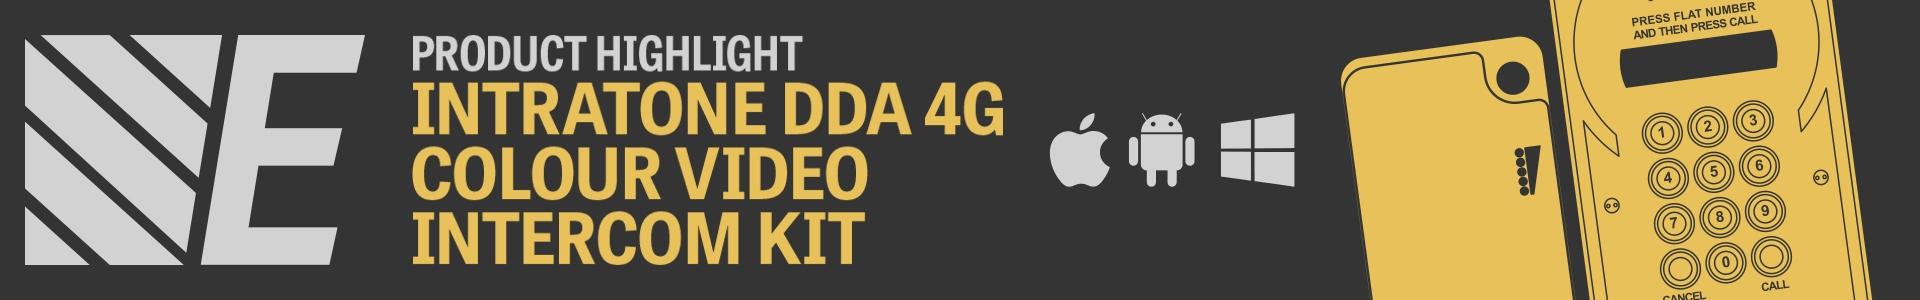 Product Highlight - Intratone DDA 4G Colour Video Intercom Kits